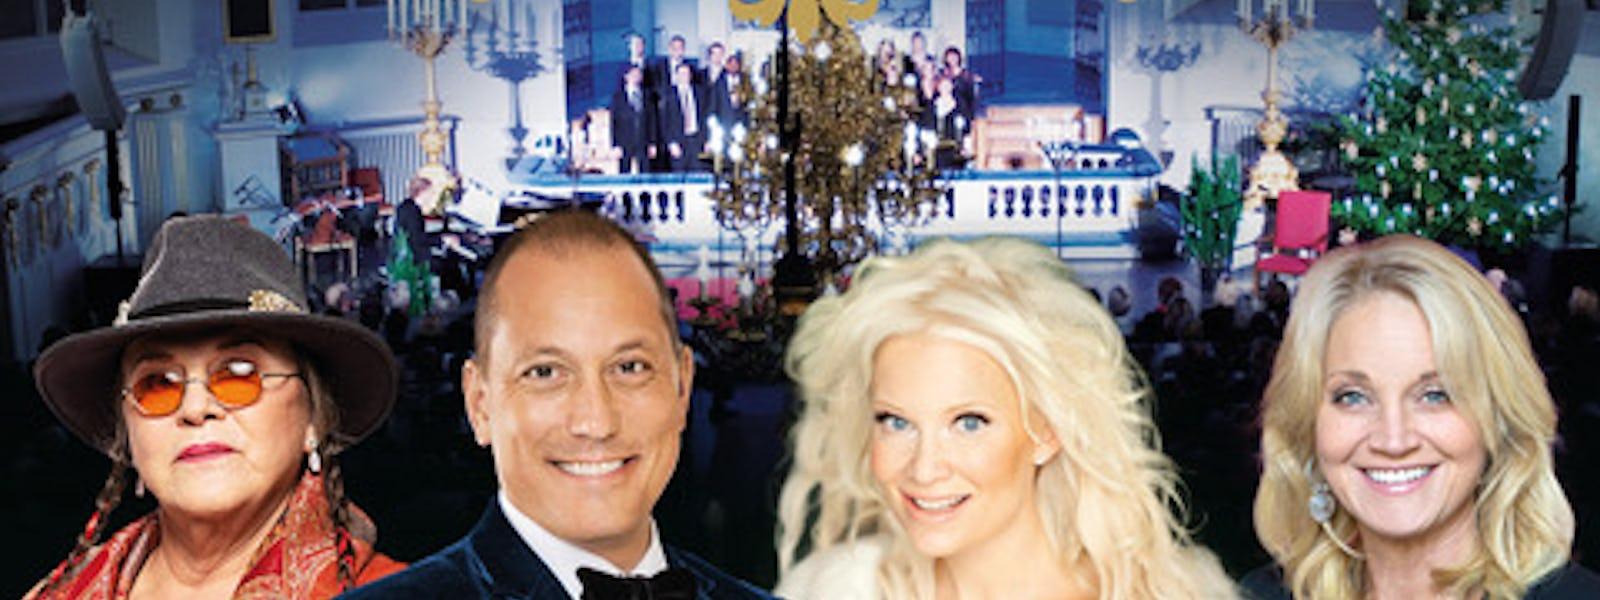 Bild - Julkonserten Änglaljus